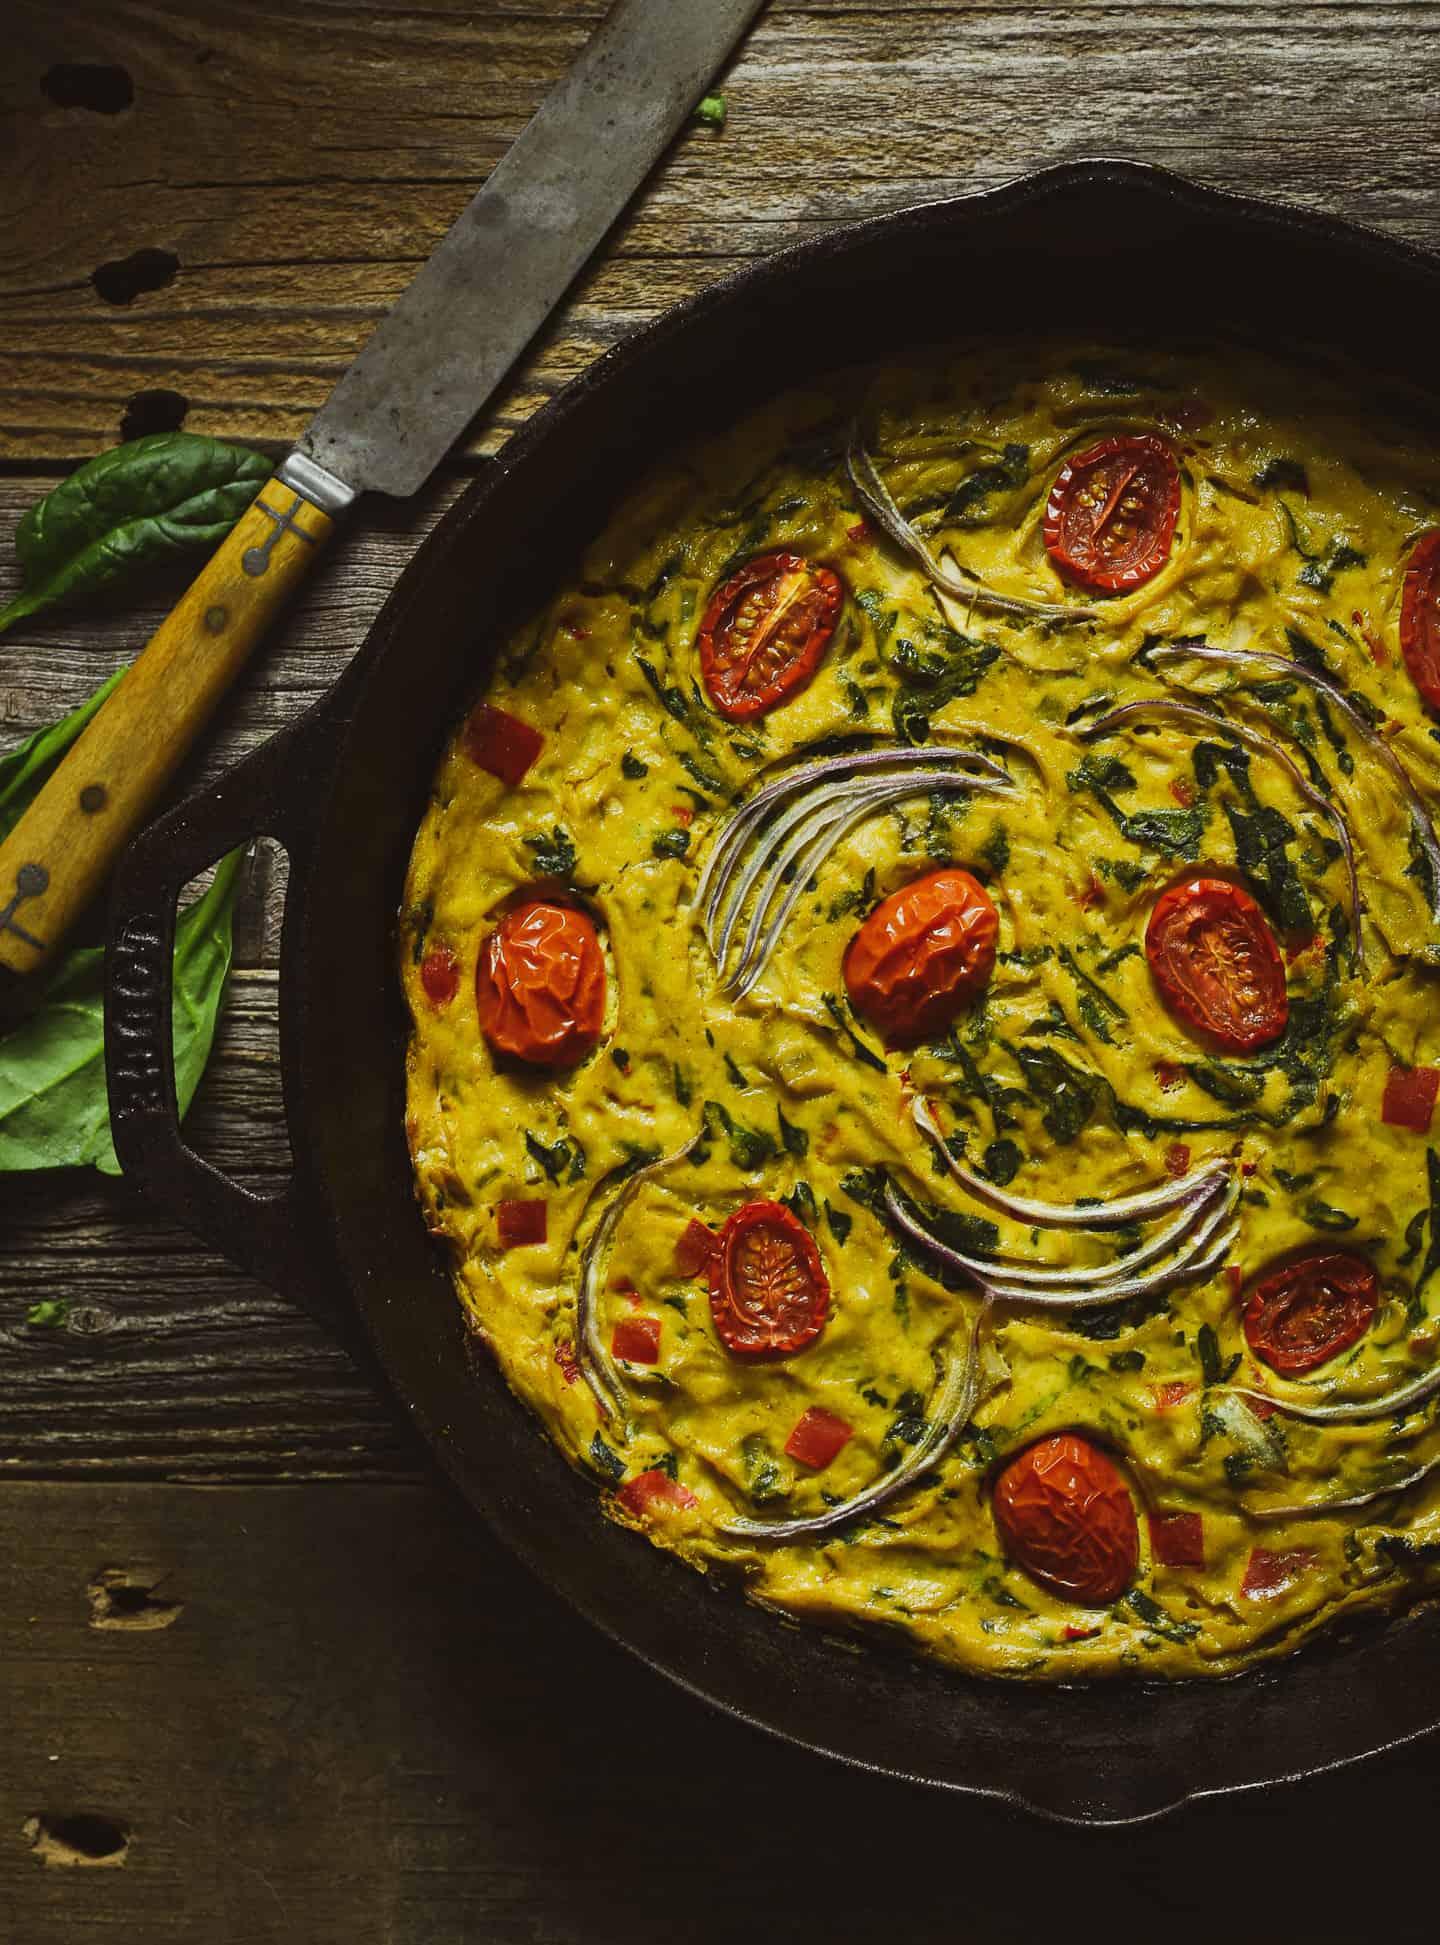 Vegetarian frittata in cast iron skillet.